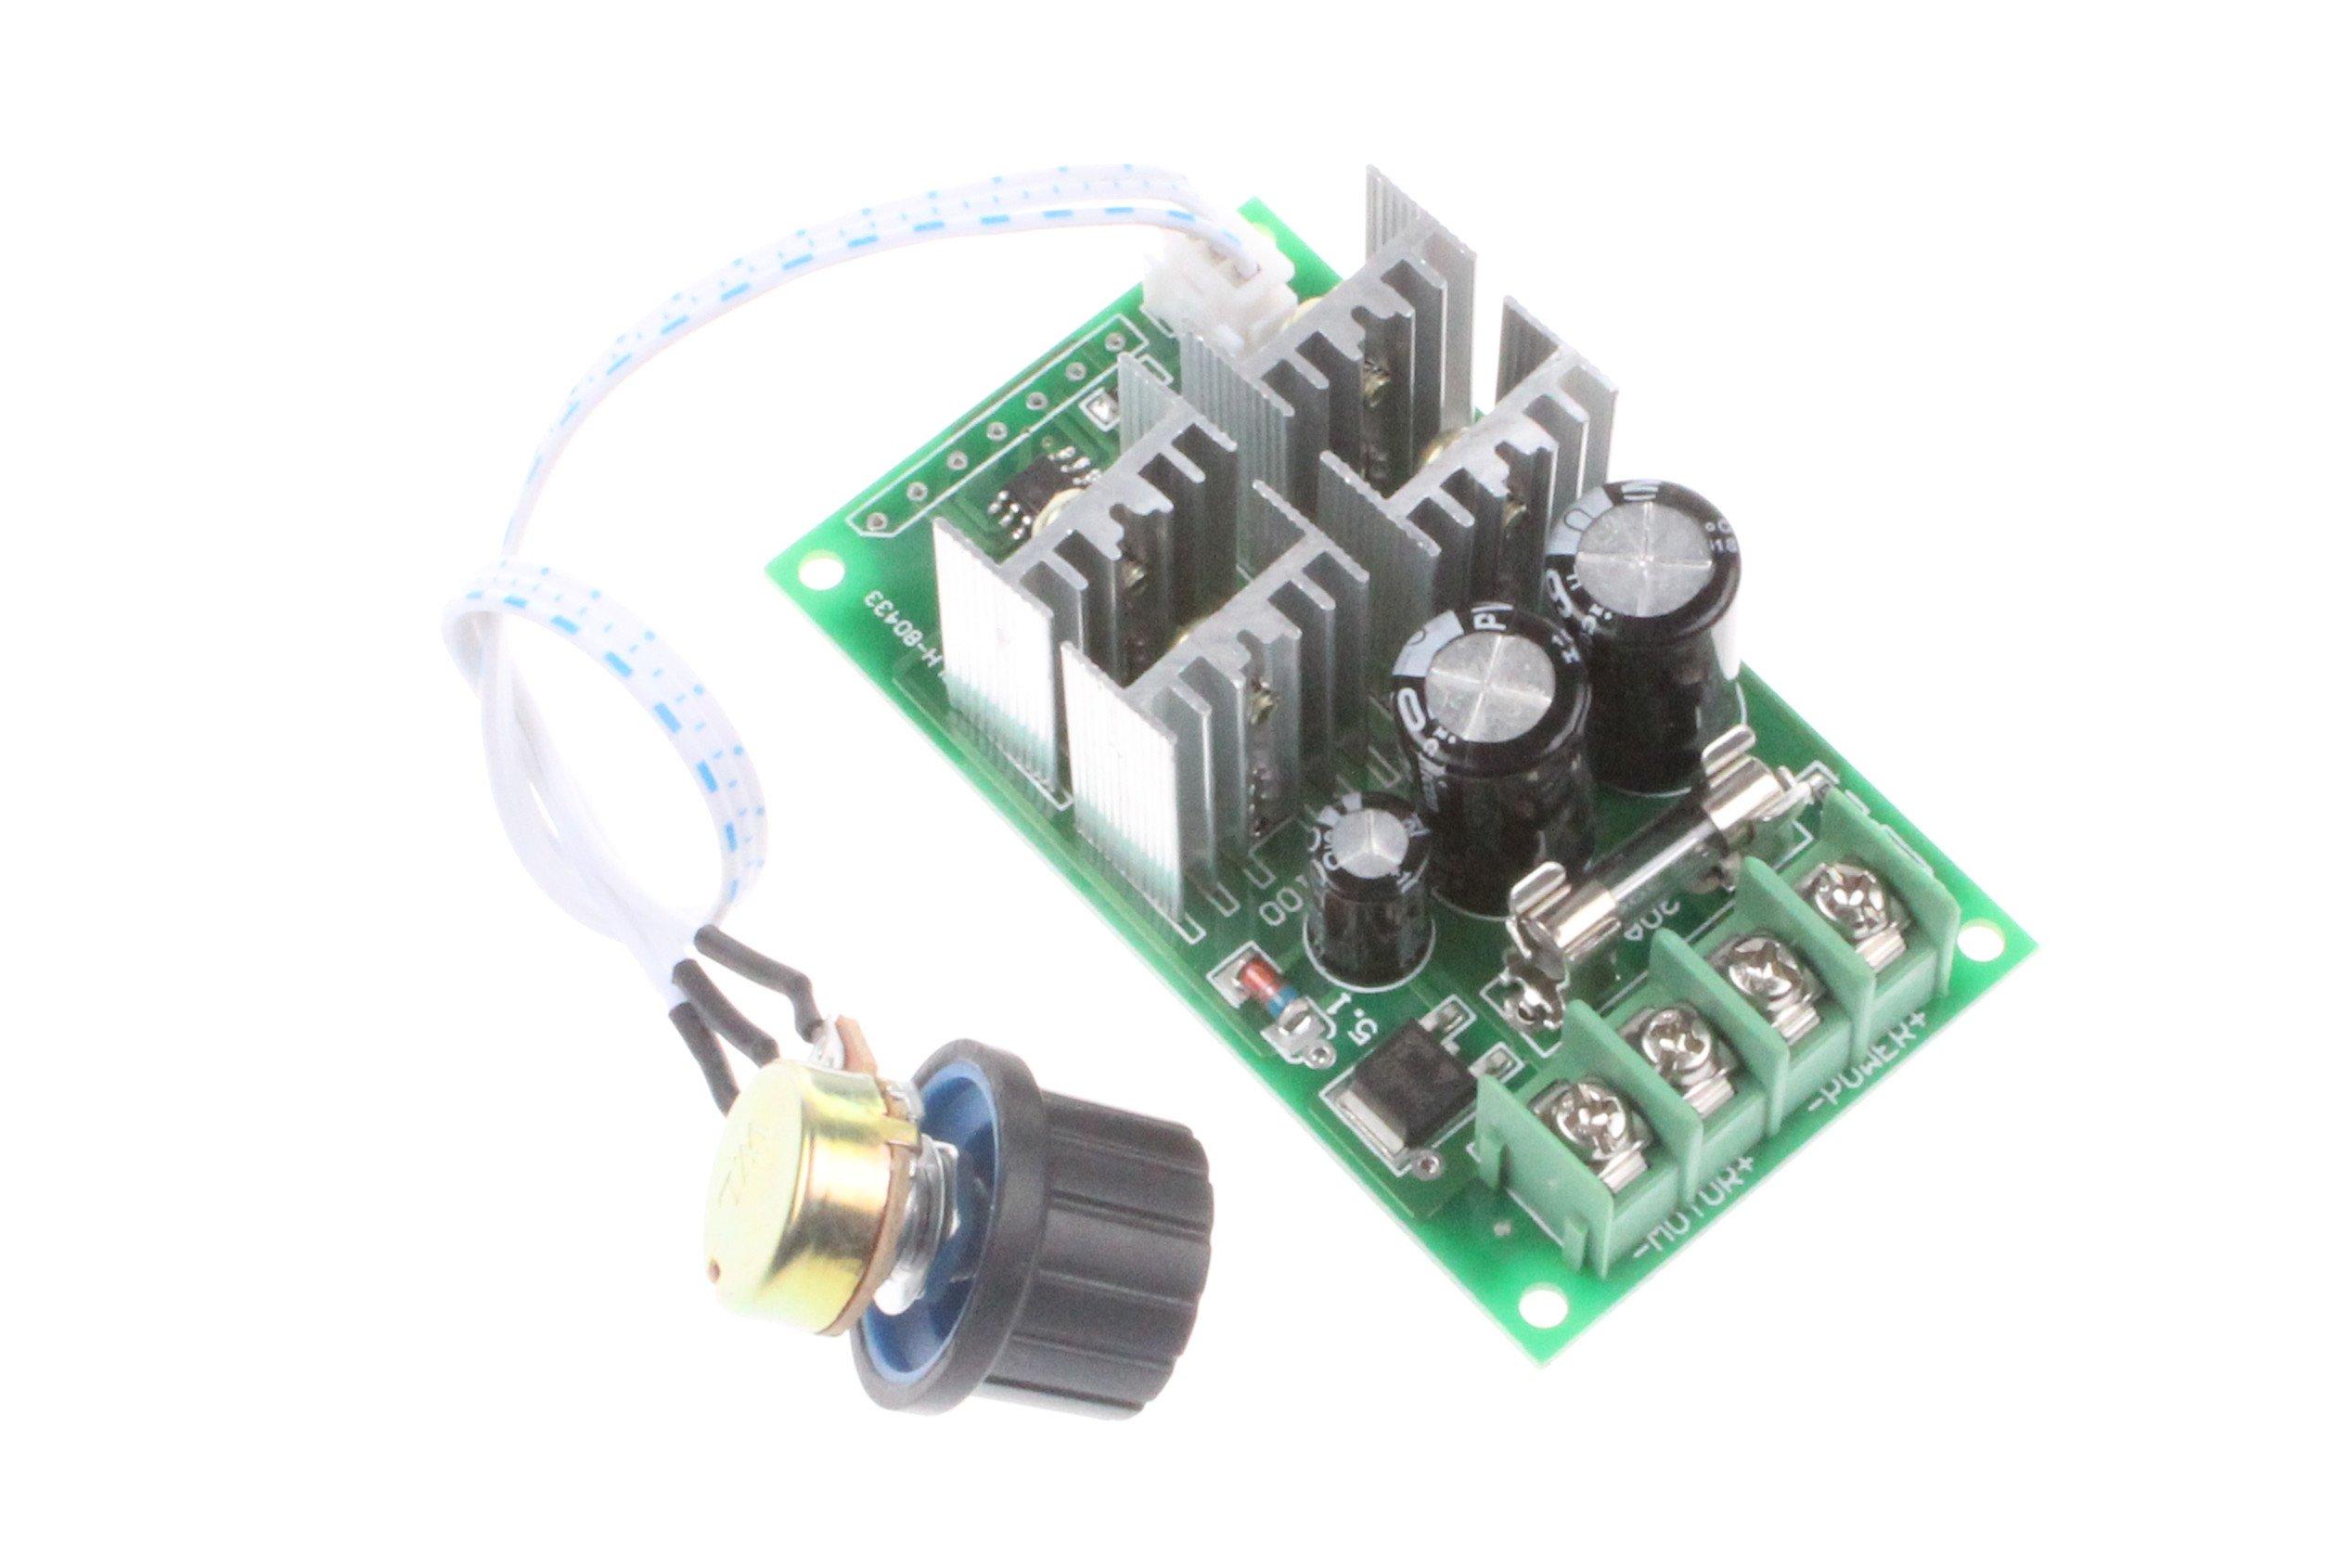 NOYITO 30A DC Motor Speed Controller DC 12V 24V 36V 48V 6-60V Brush Motor Controller Speed Range 0-100% Support PLC 0-5V MCU (30A)